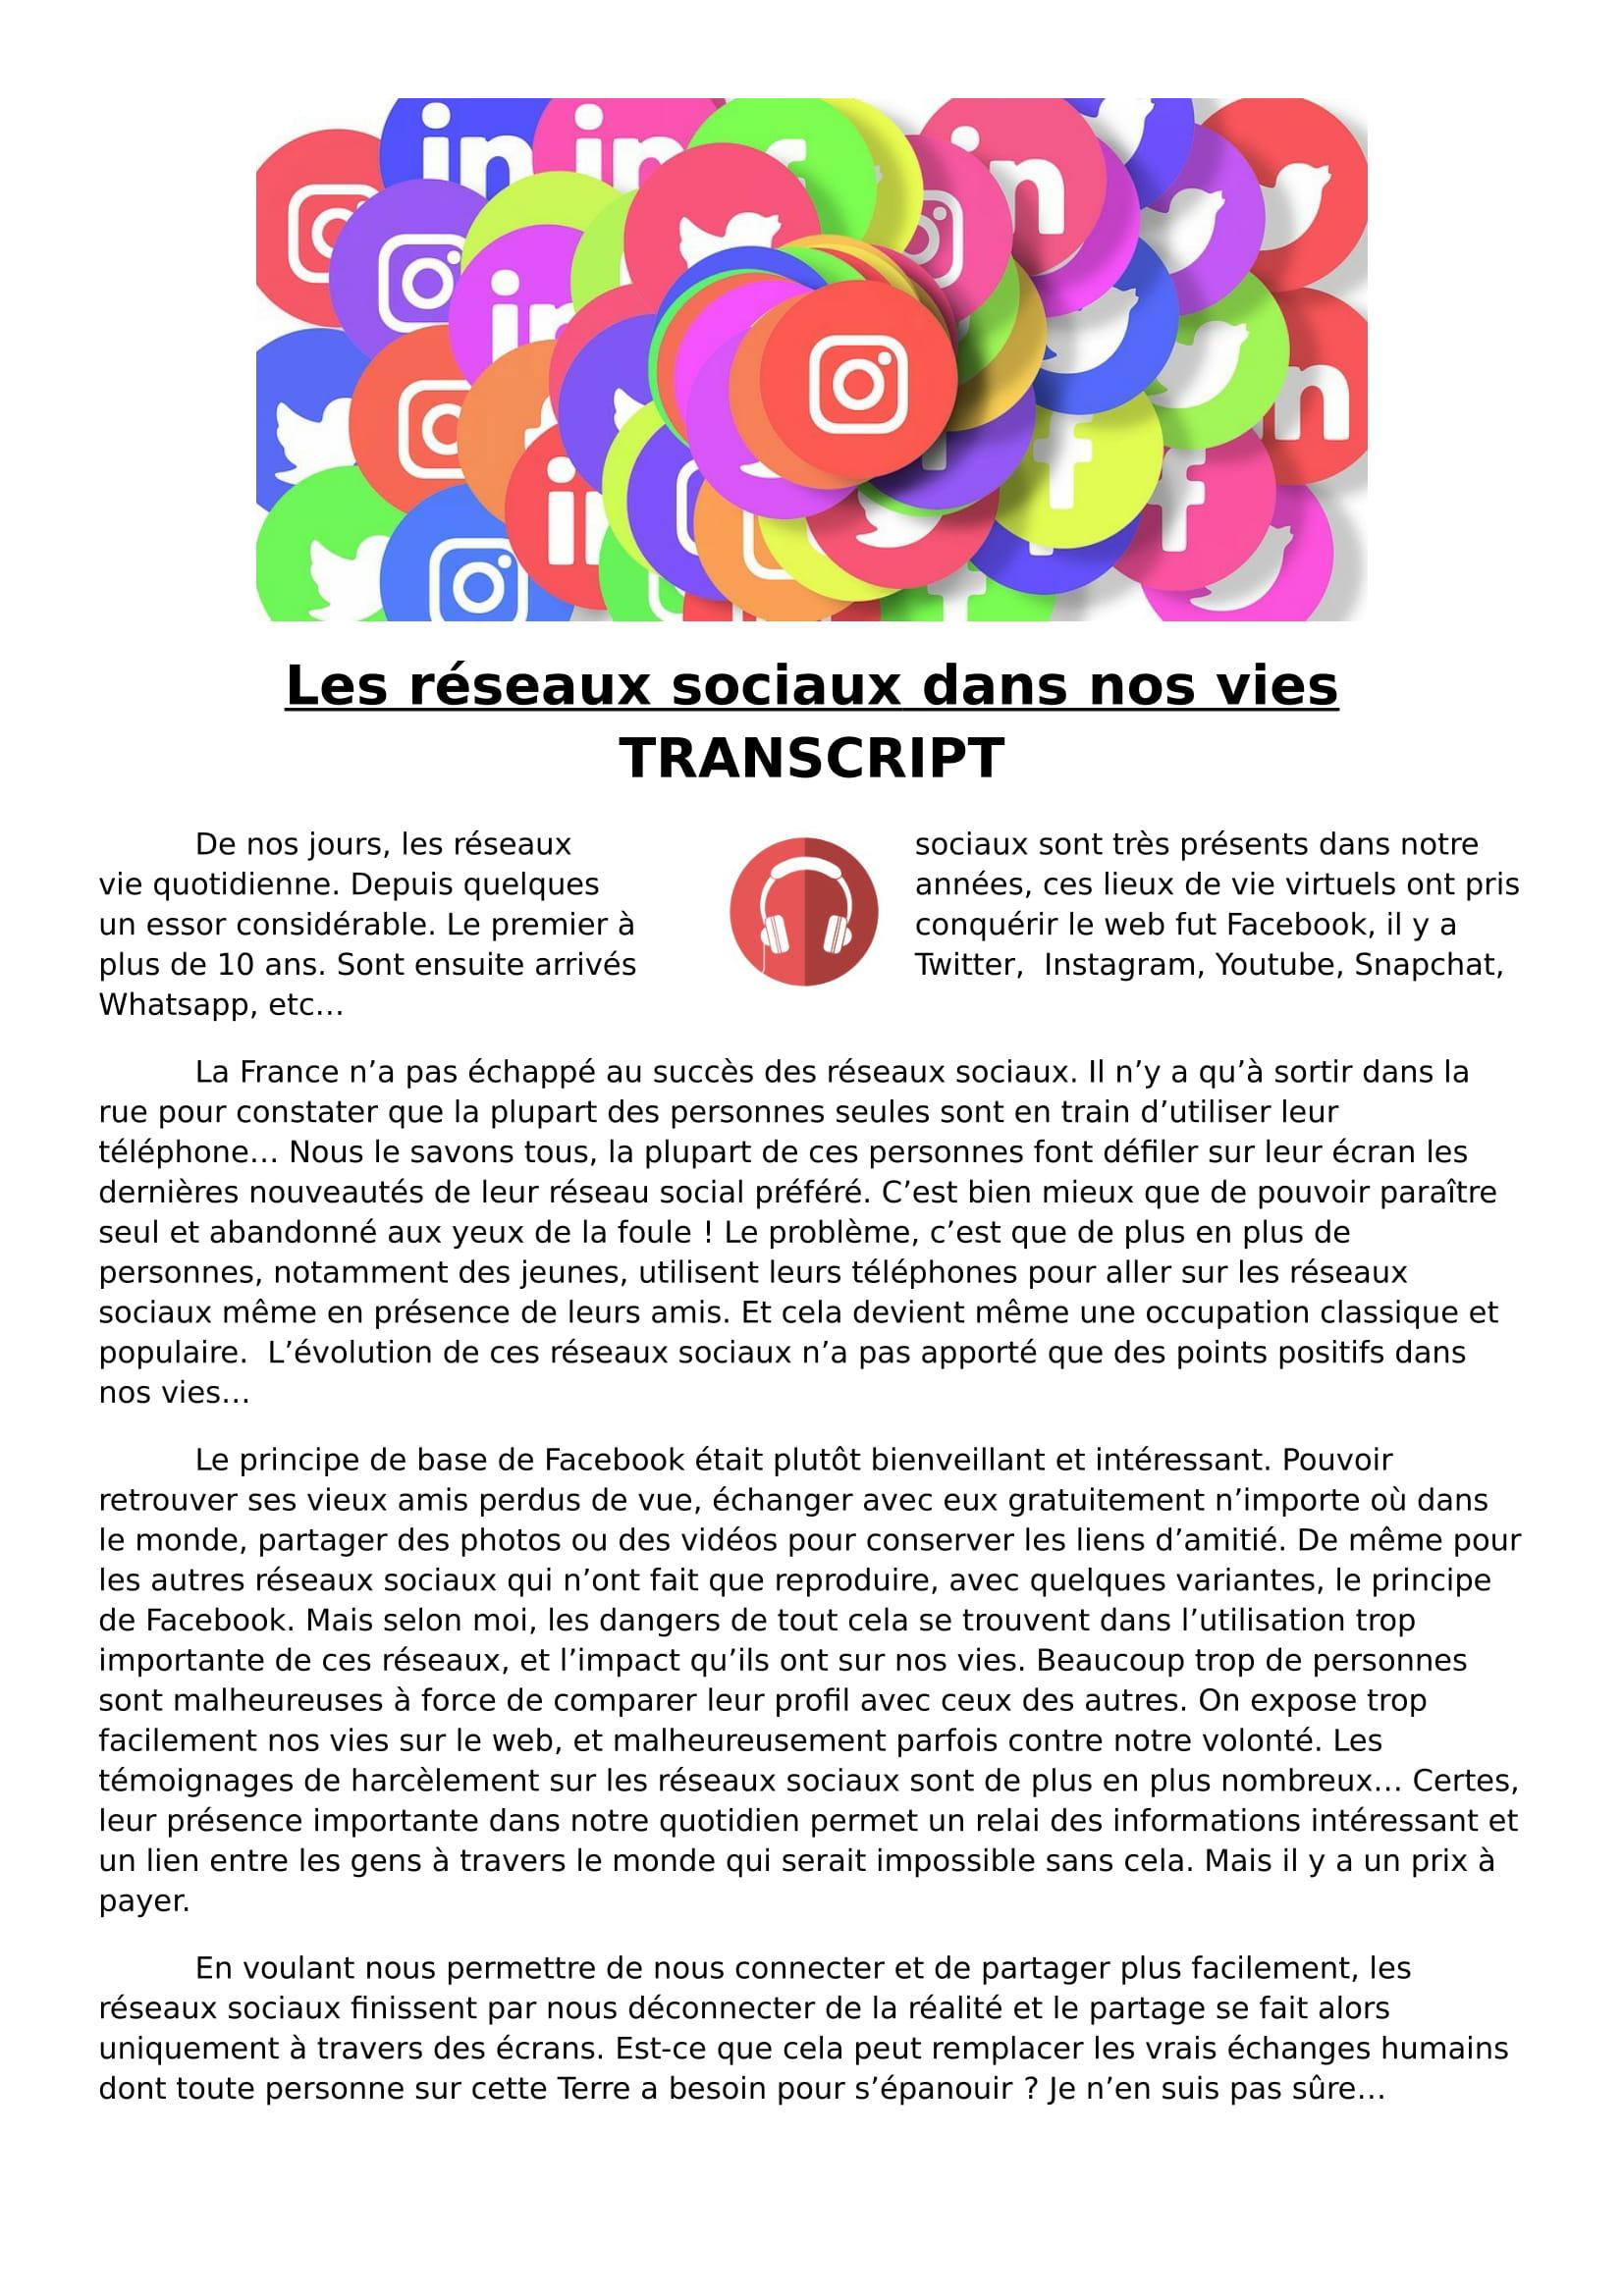 Les Reseaux Sociaux French Gcse Listening Lesson Private German Tutor Online French Teacher Qualified Efl Tutor [ 2339 x 1653 Pixel ]